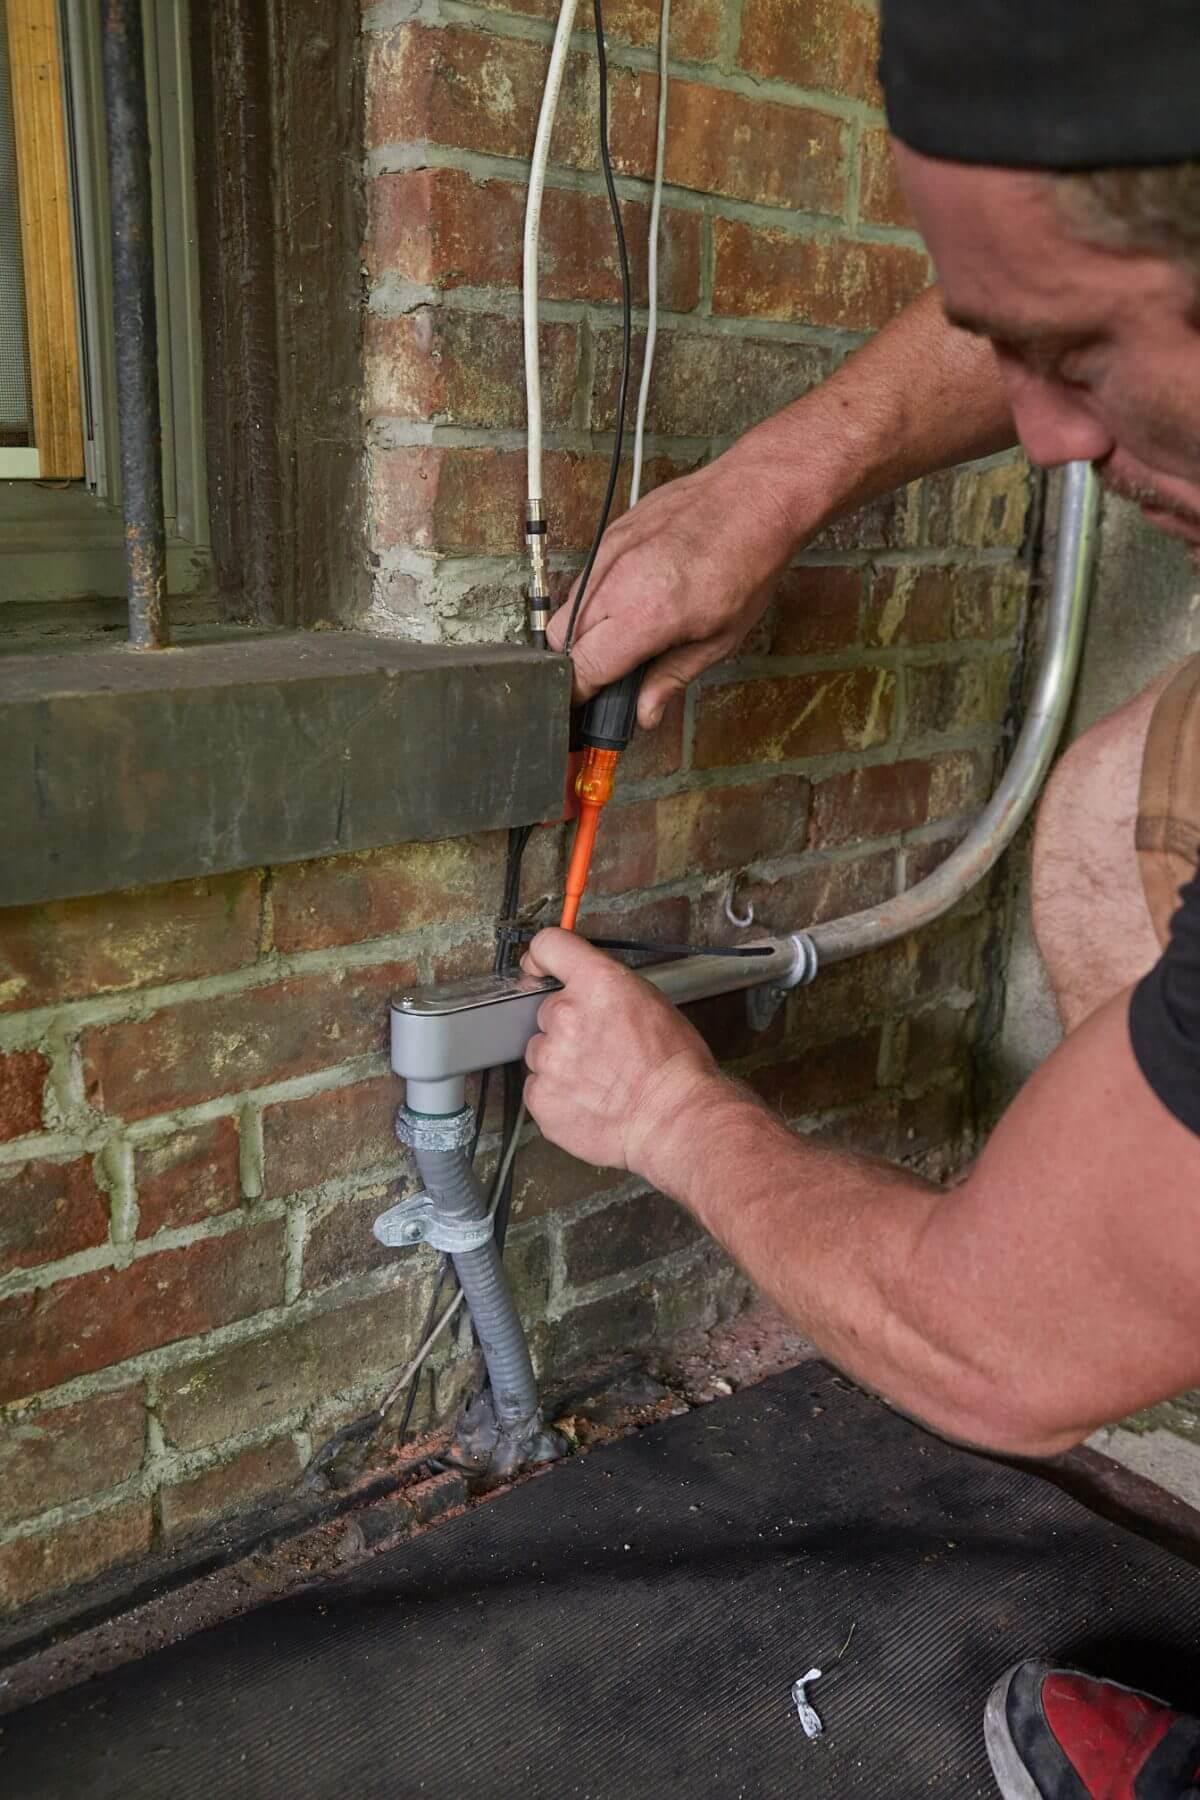 Wiring installation in progress